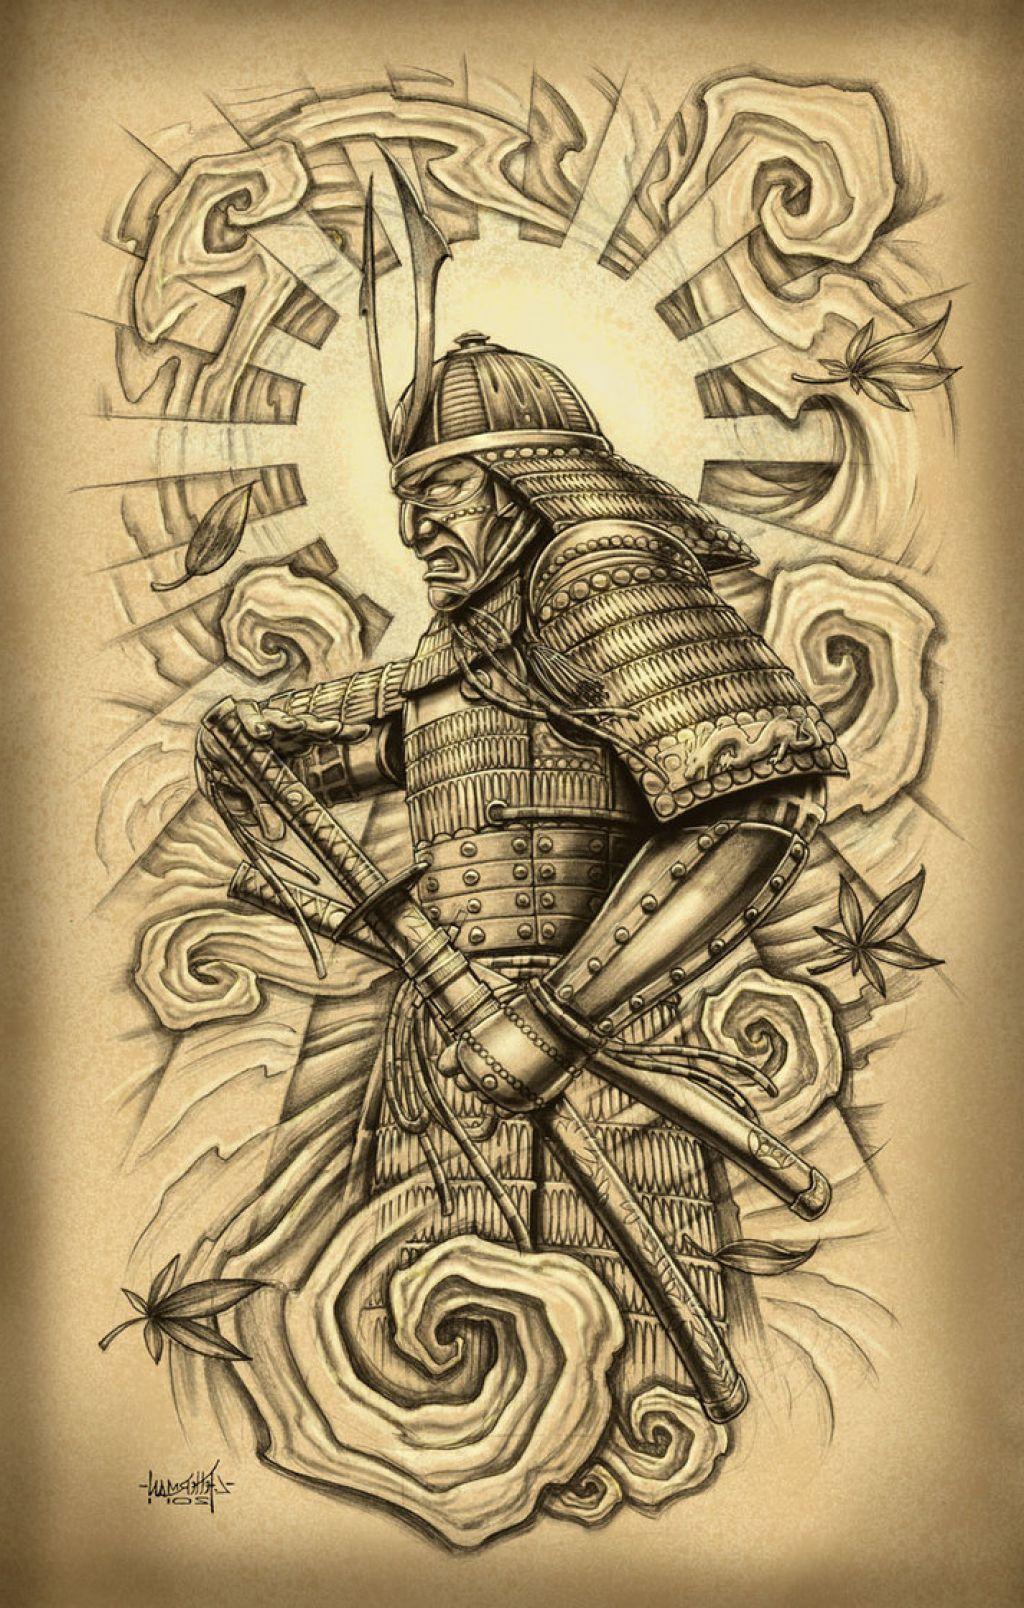 Samurai Art For Tattoo By Me Oriental Tattoos Pinterest - Best traditional samurai tattoo designs meaning men women